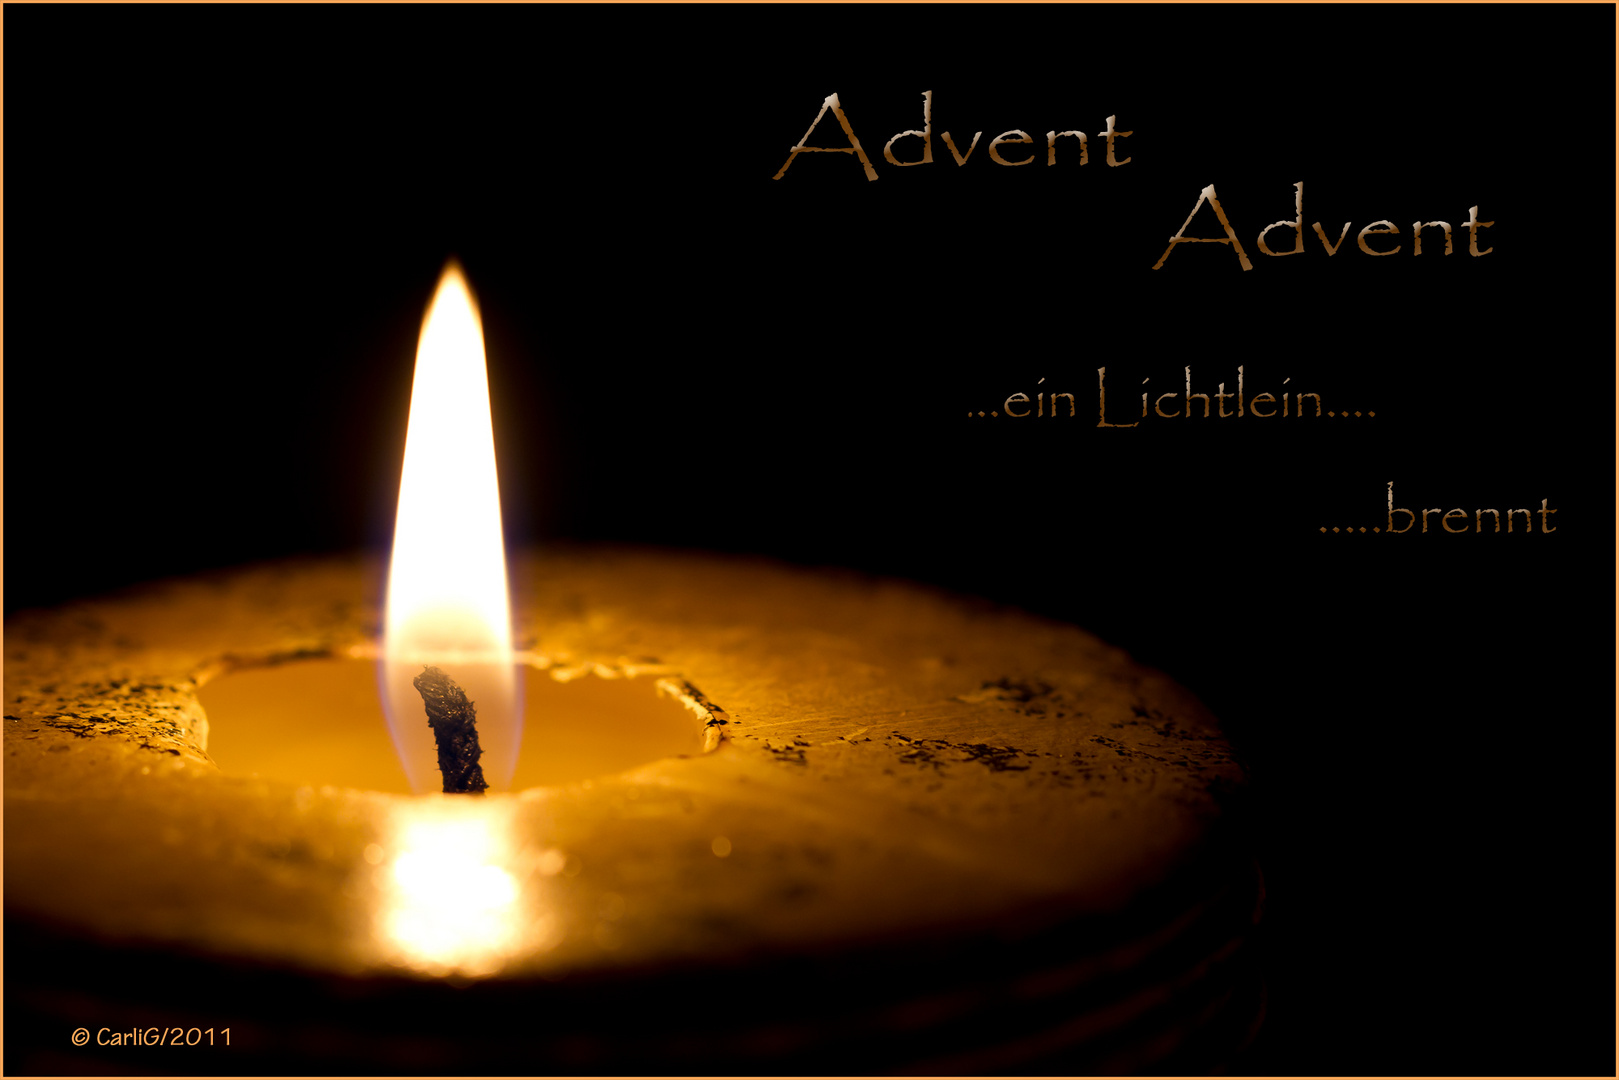 Advent Advent...